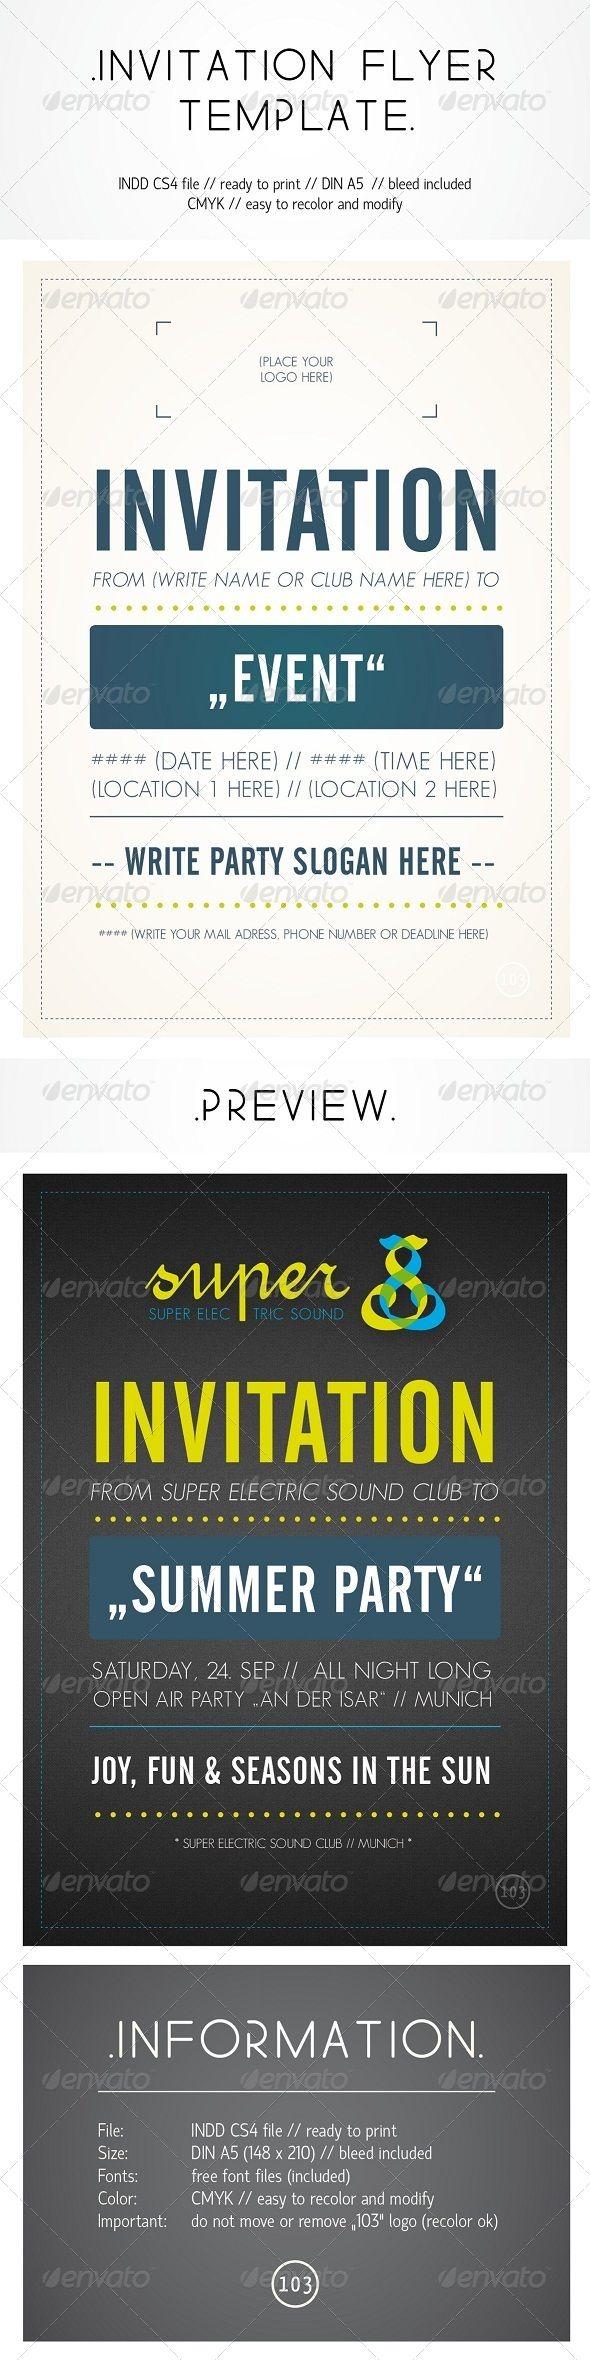 invitation flyer template invitations card template indesign indd download here http. Black Bedroom Furniture Sets. Home Design Ideas